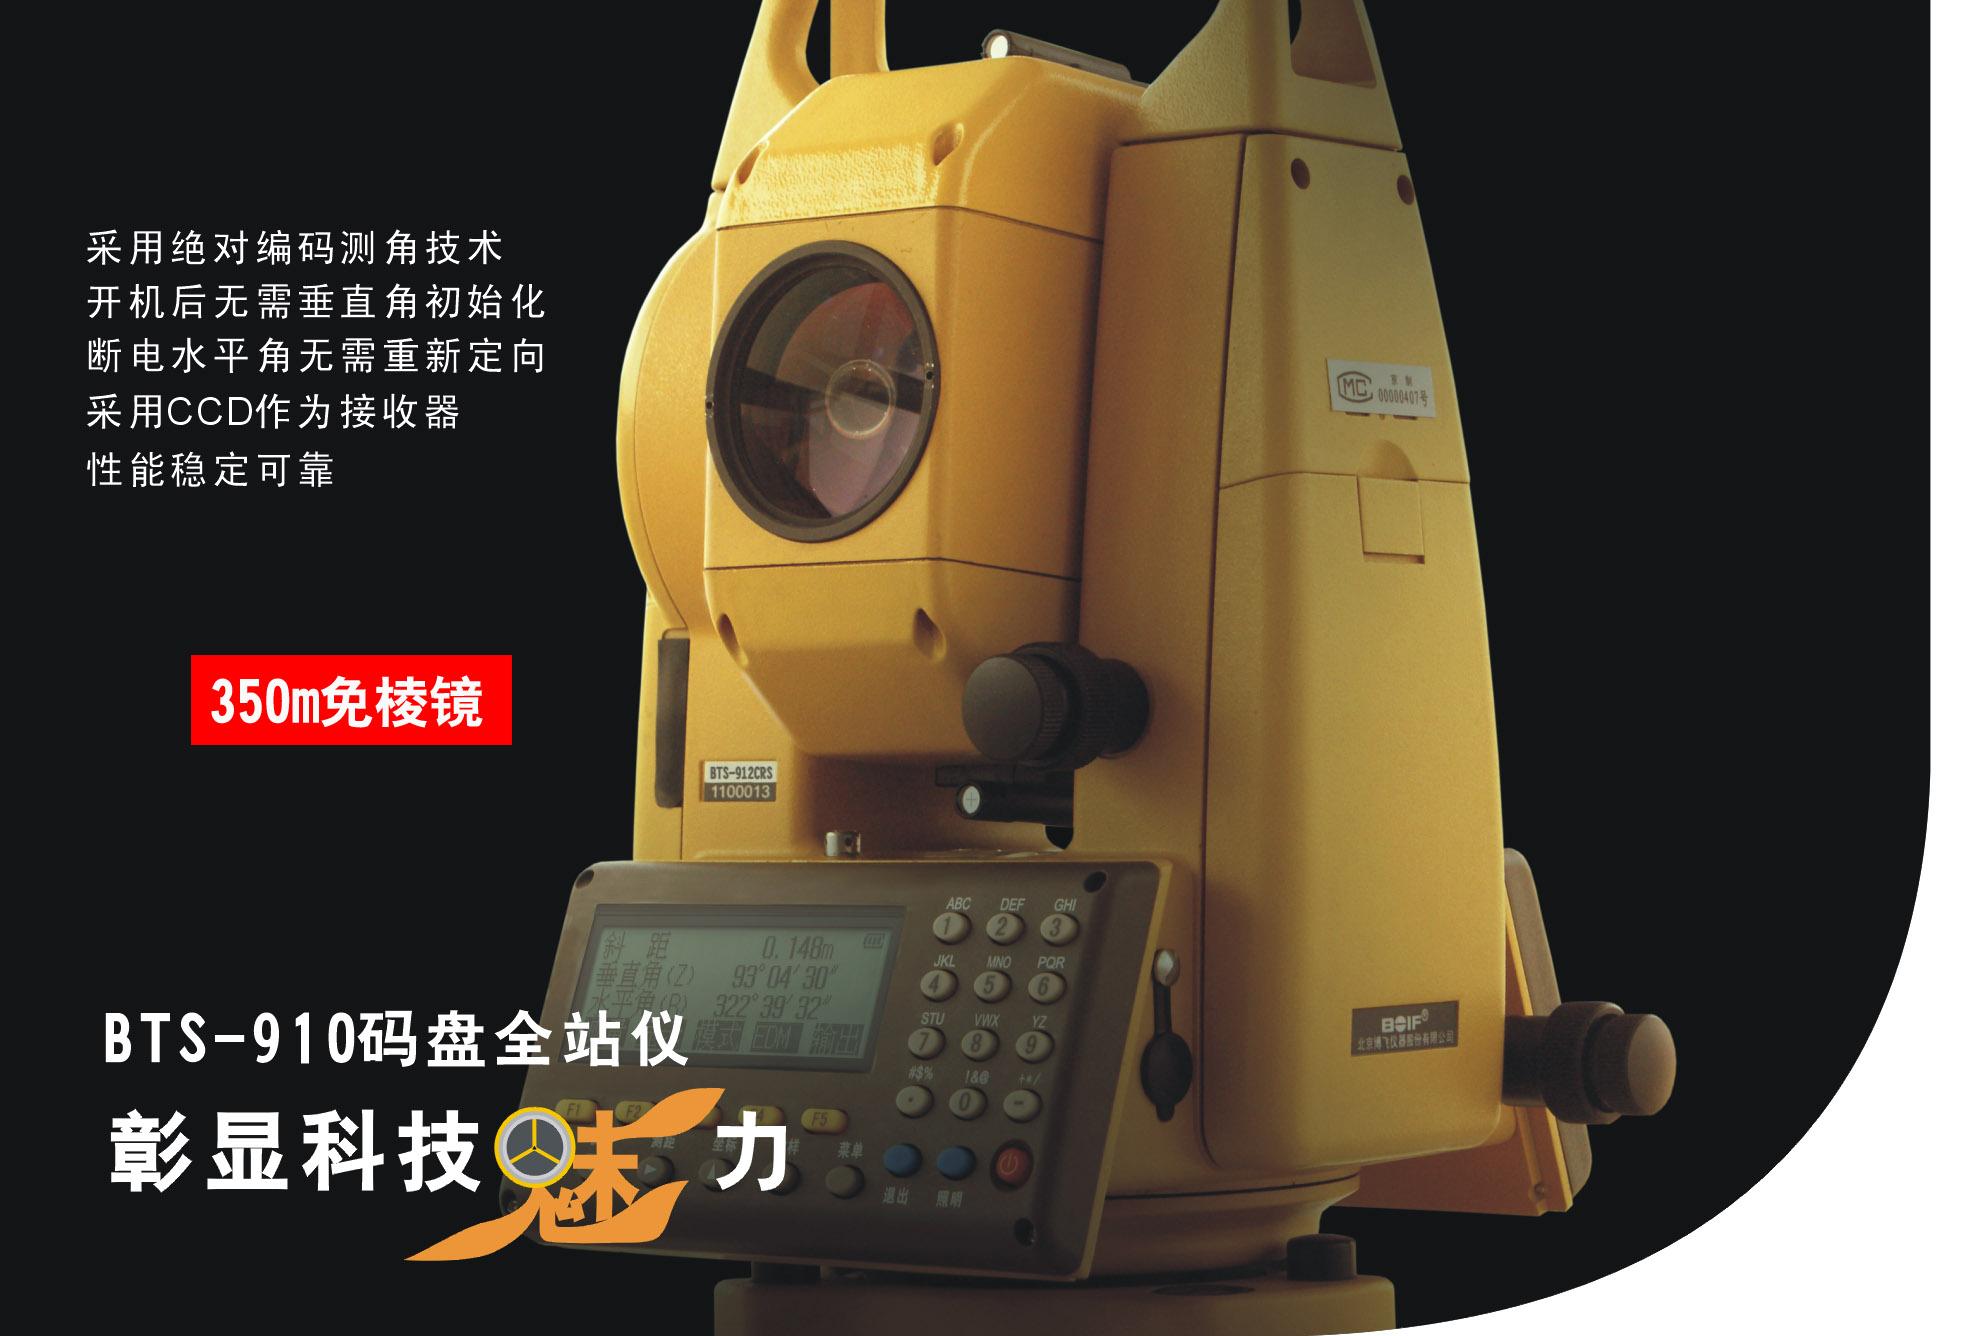 BTS-912C型码盘全站仪